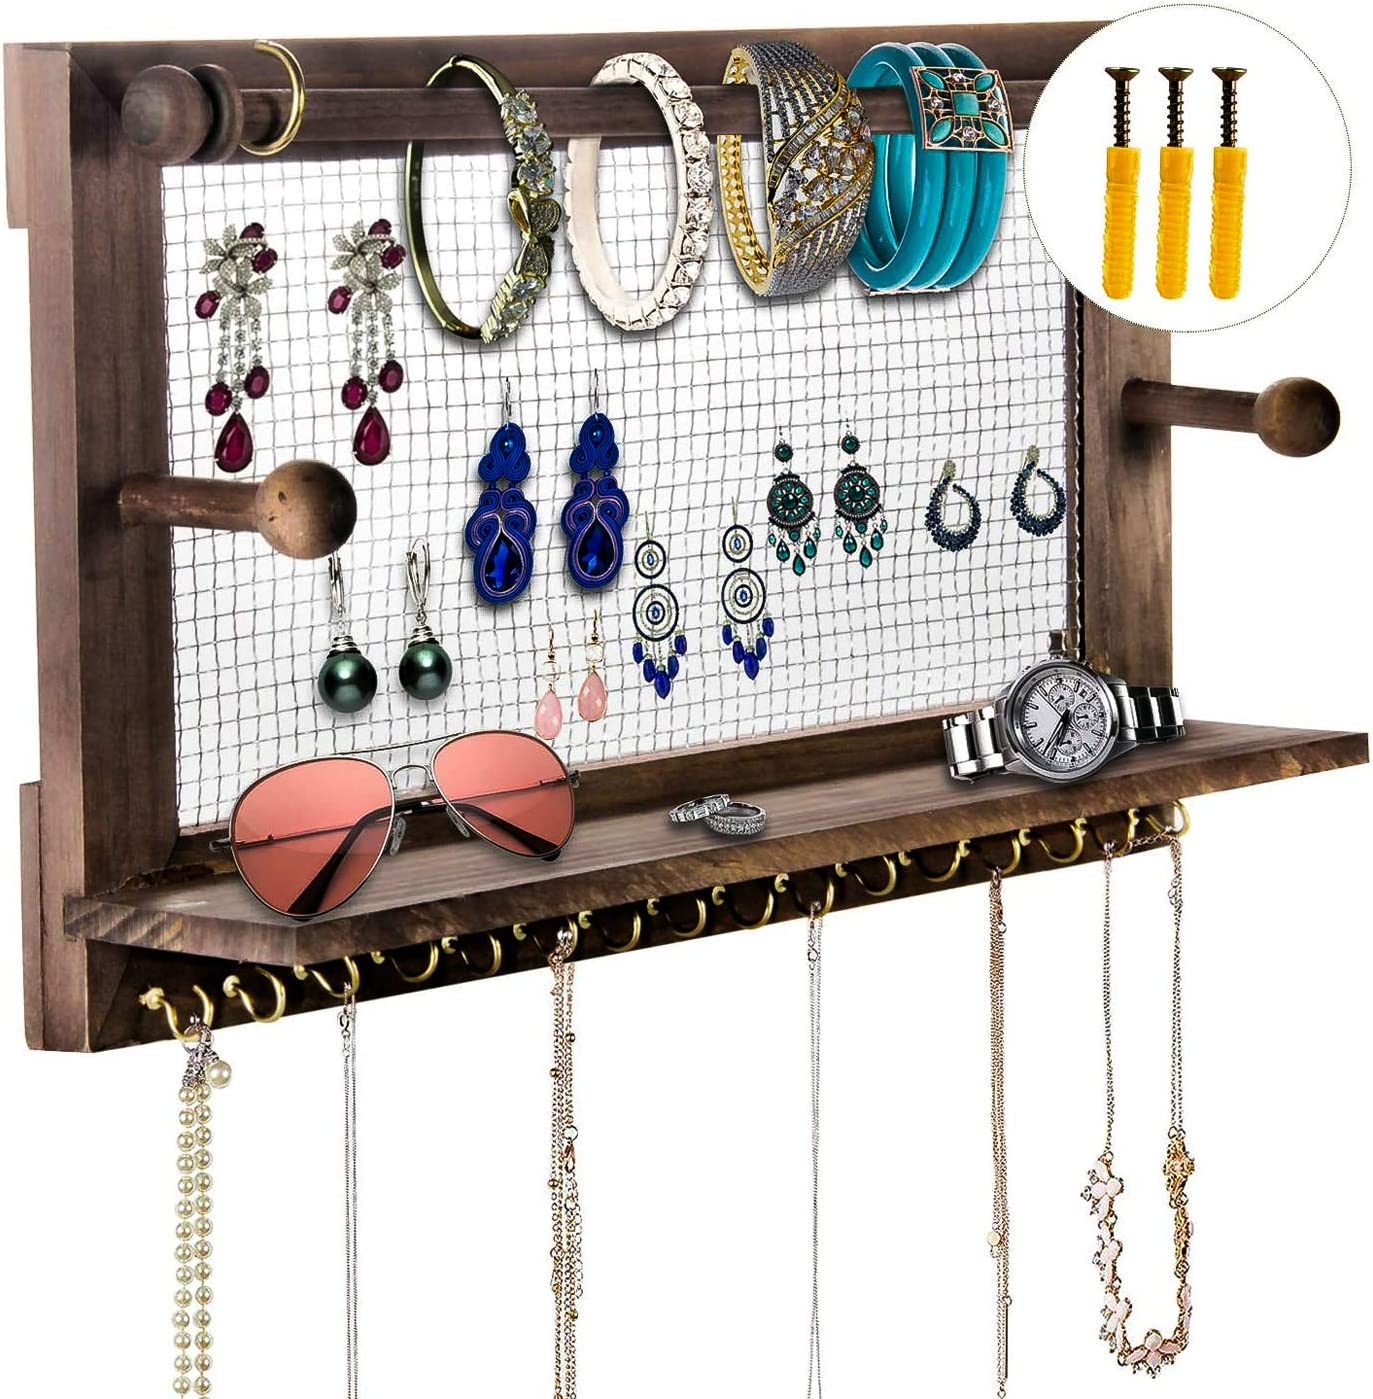 POZEAN Rustic Jewelry Organizer Wall Mounted Wooden Jewelry Holder